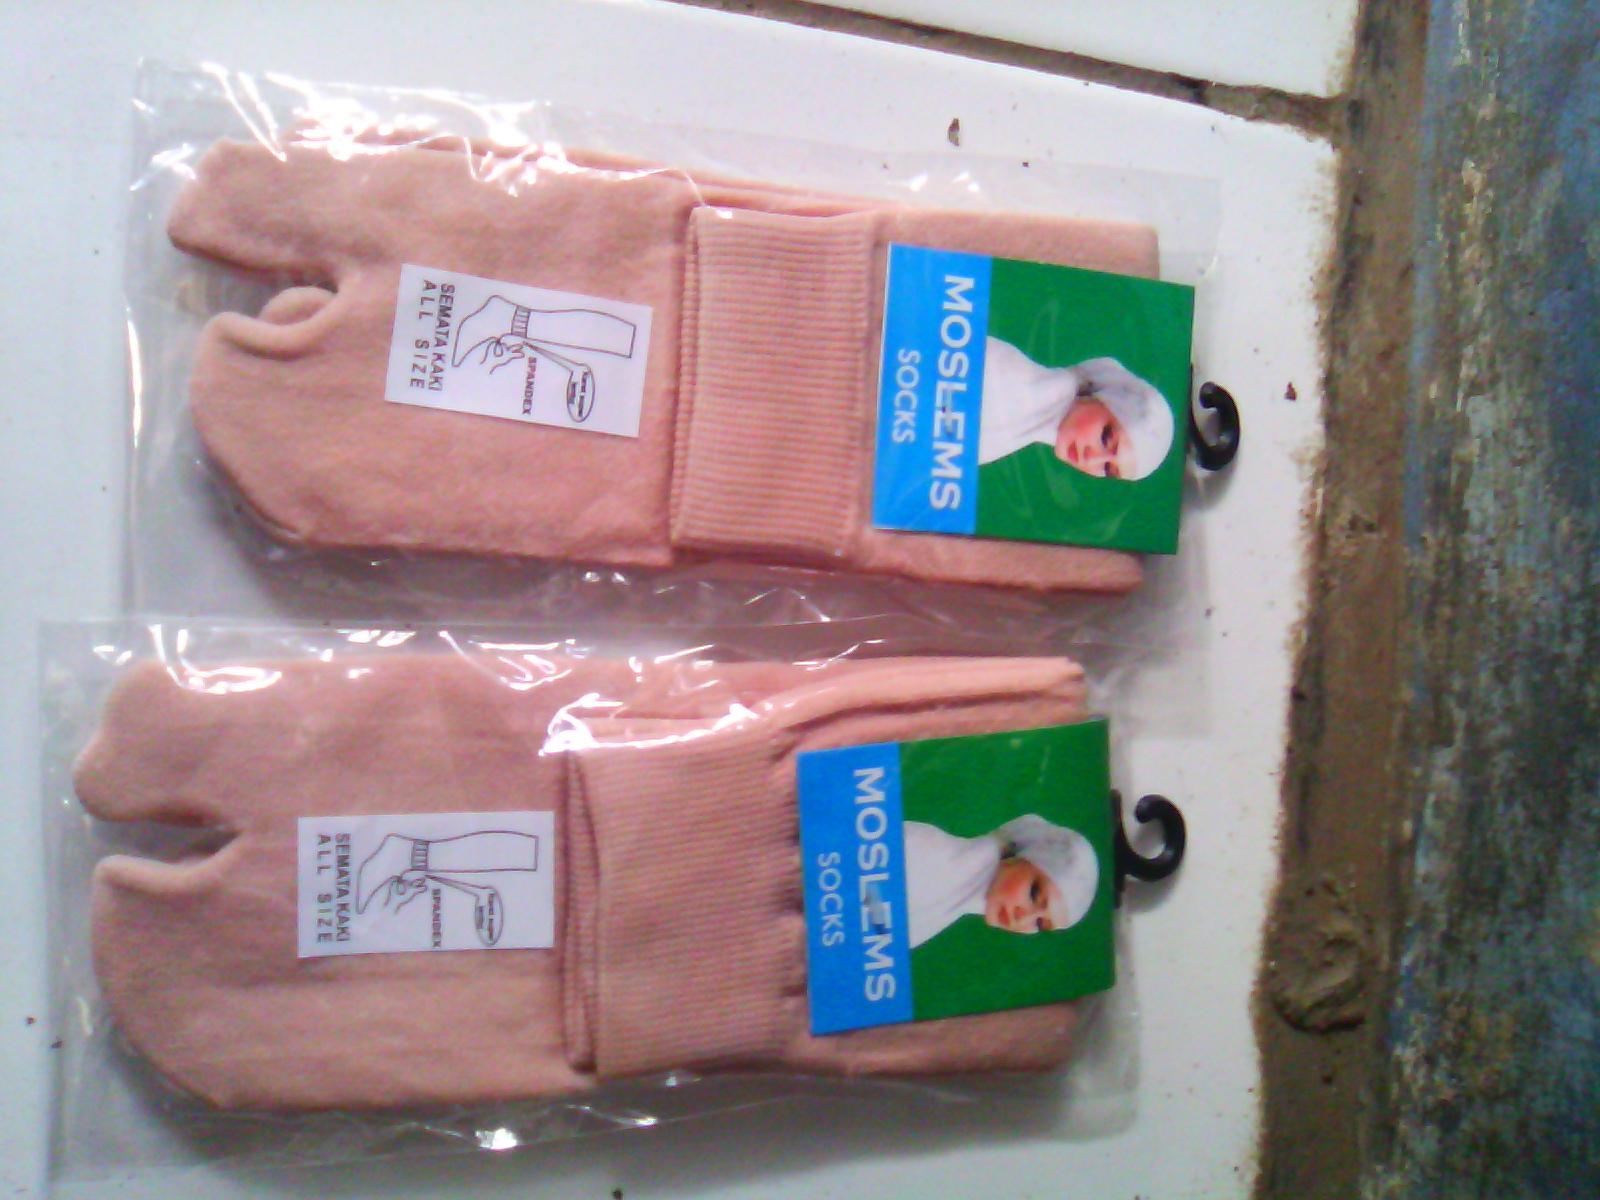 Khulaemis Shop Aneka Kaos Kaki Pramuka Sma Sd Rp 3600000 Lusin Smp 3800000 4000000